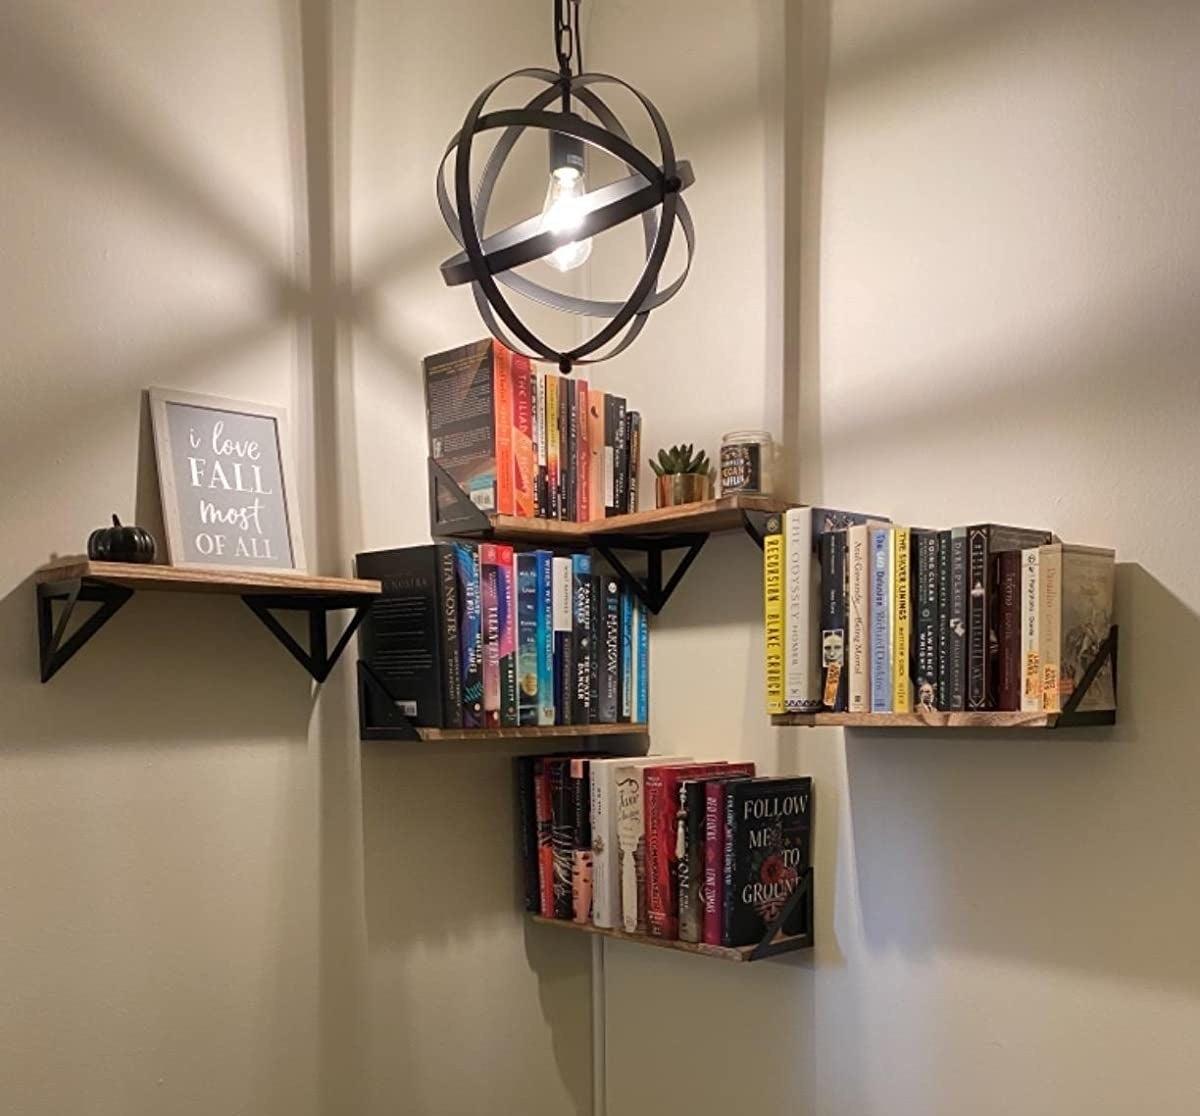 The wooden shelves